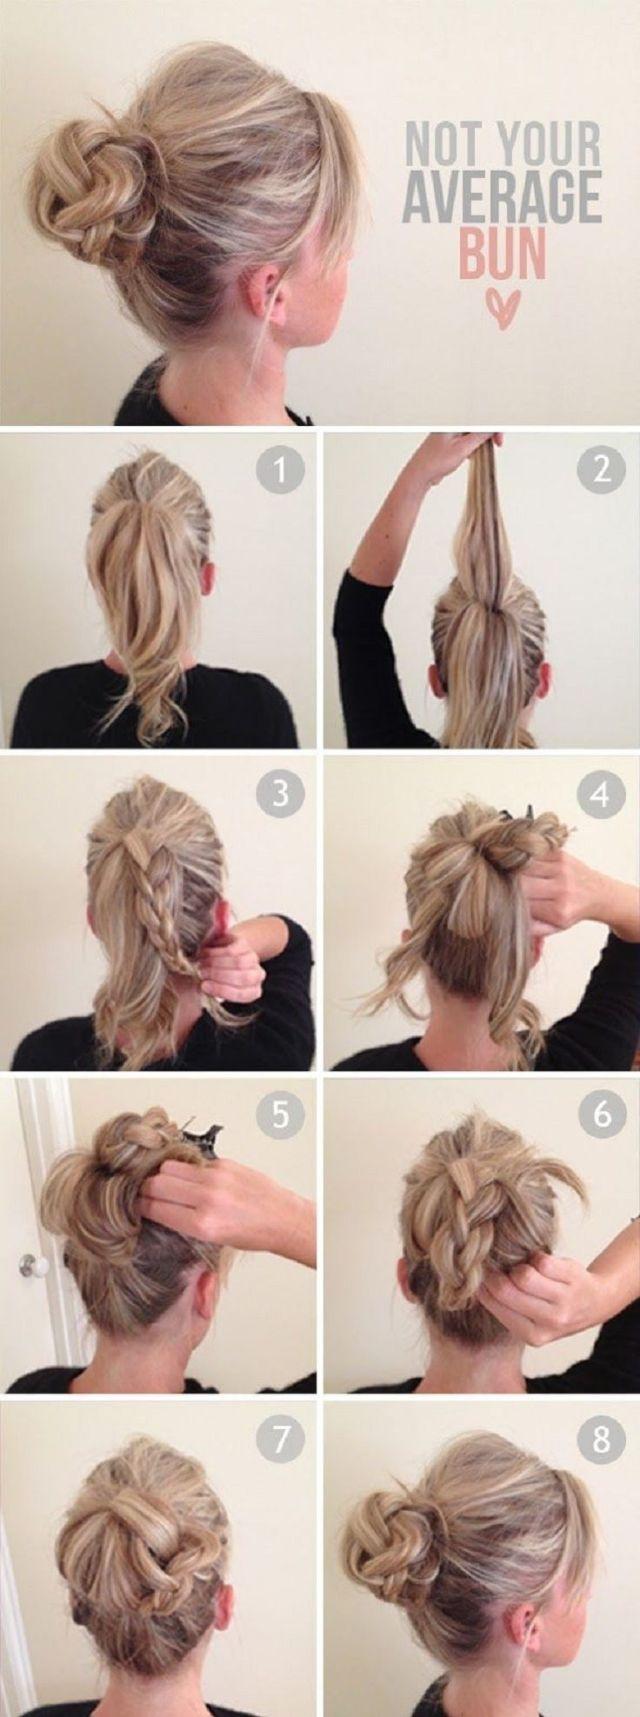 14 amazing double braid bun hairstyles - pretty designs